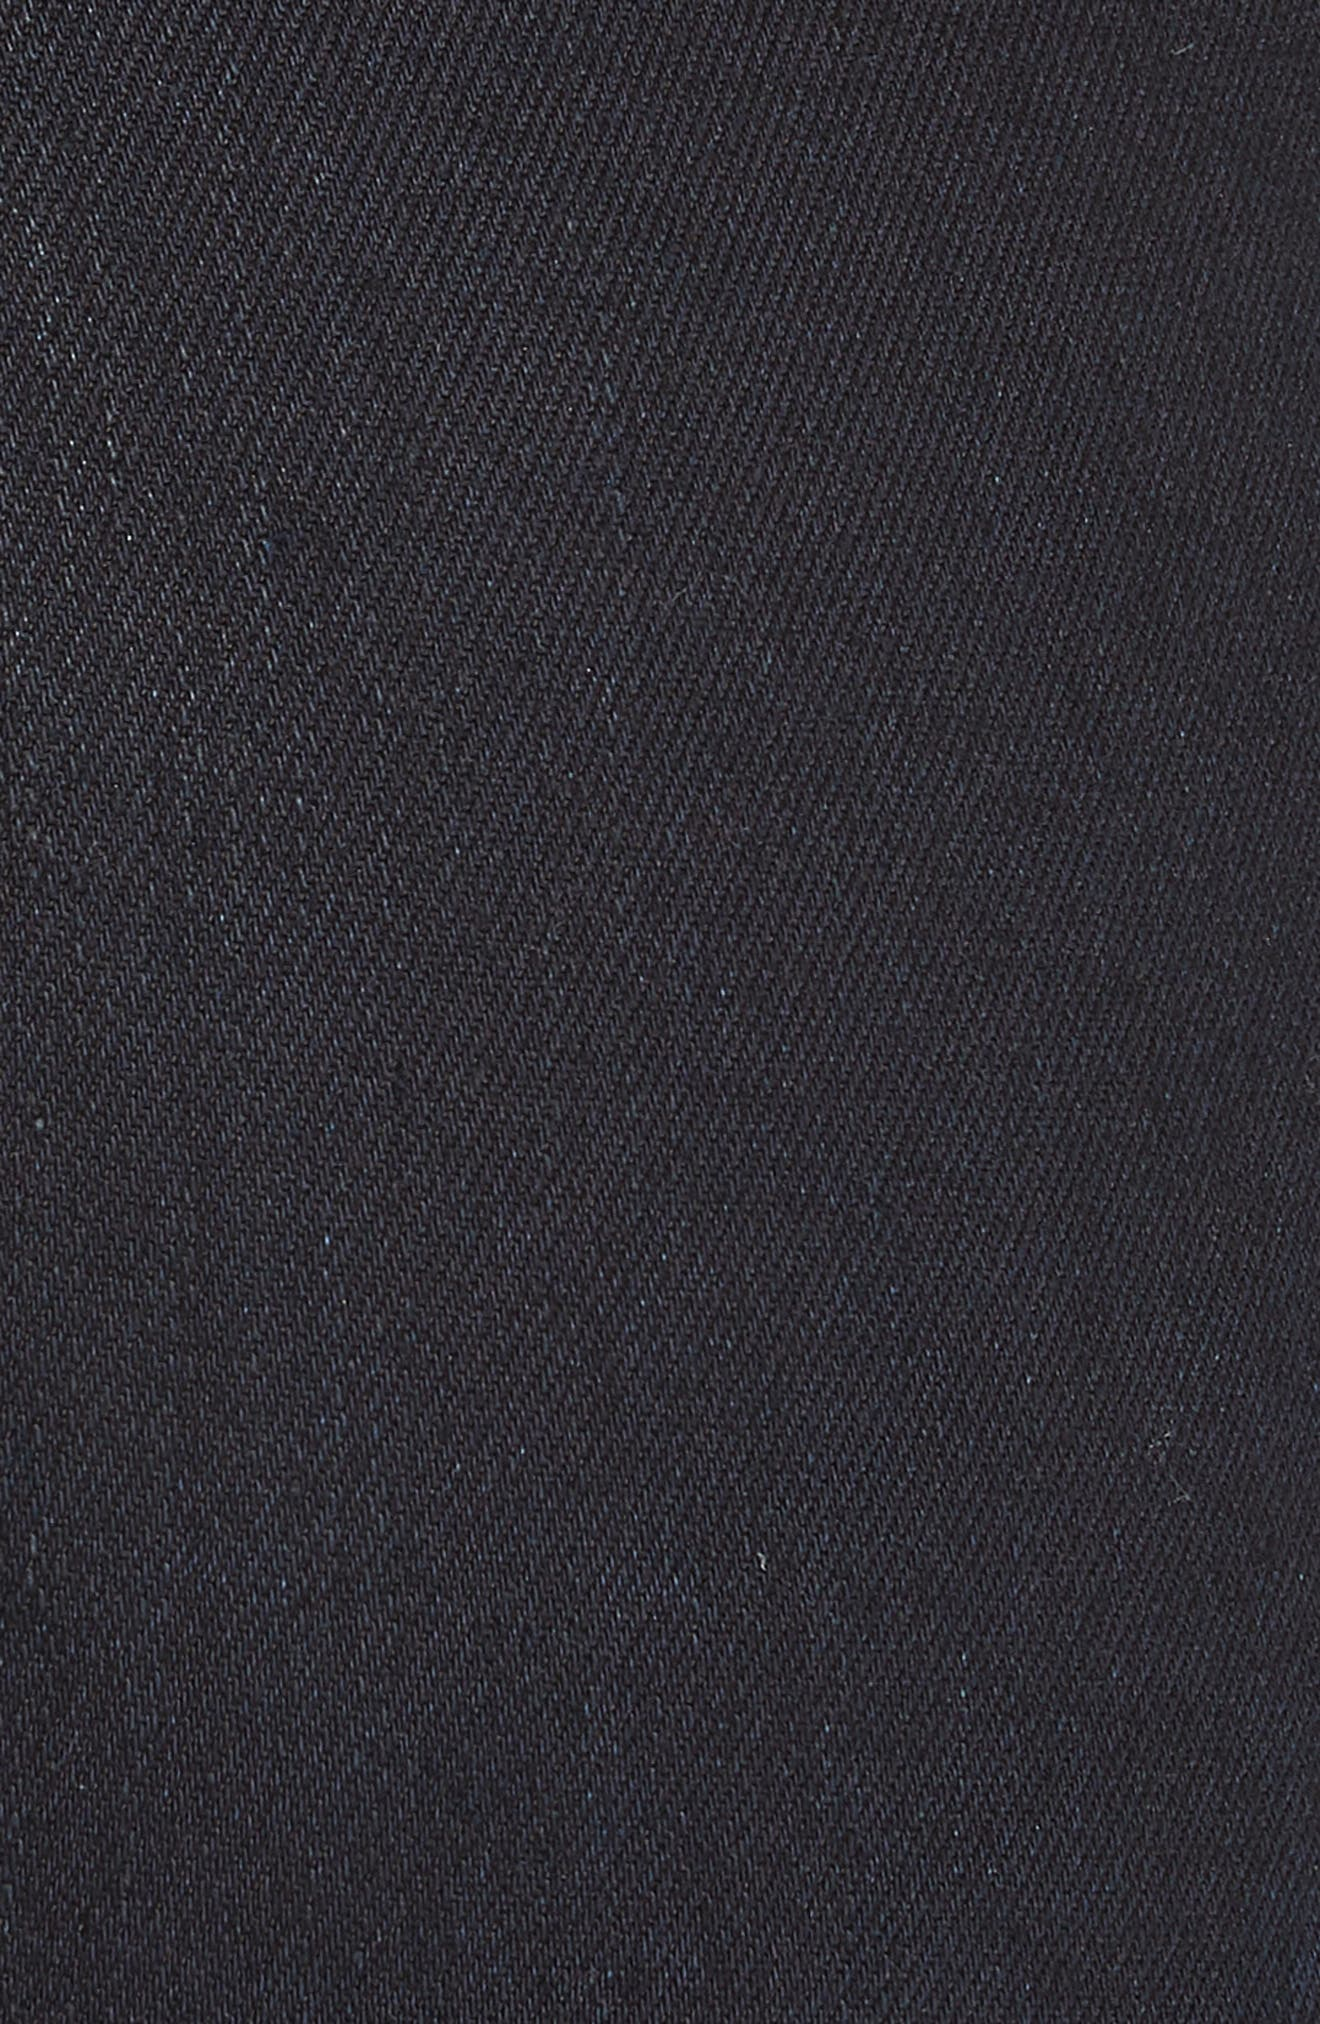 VERONICA BEARD, Dalida Button Detail Skinny Flare Jeans, Alternate thumbnail 5, color, INDIGO